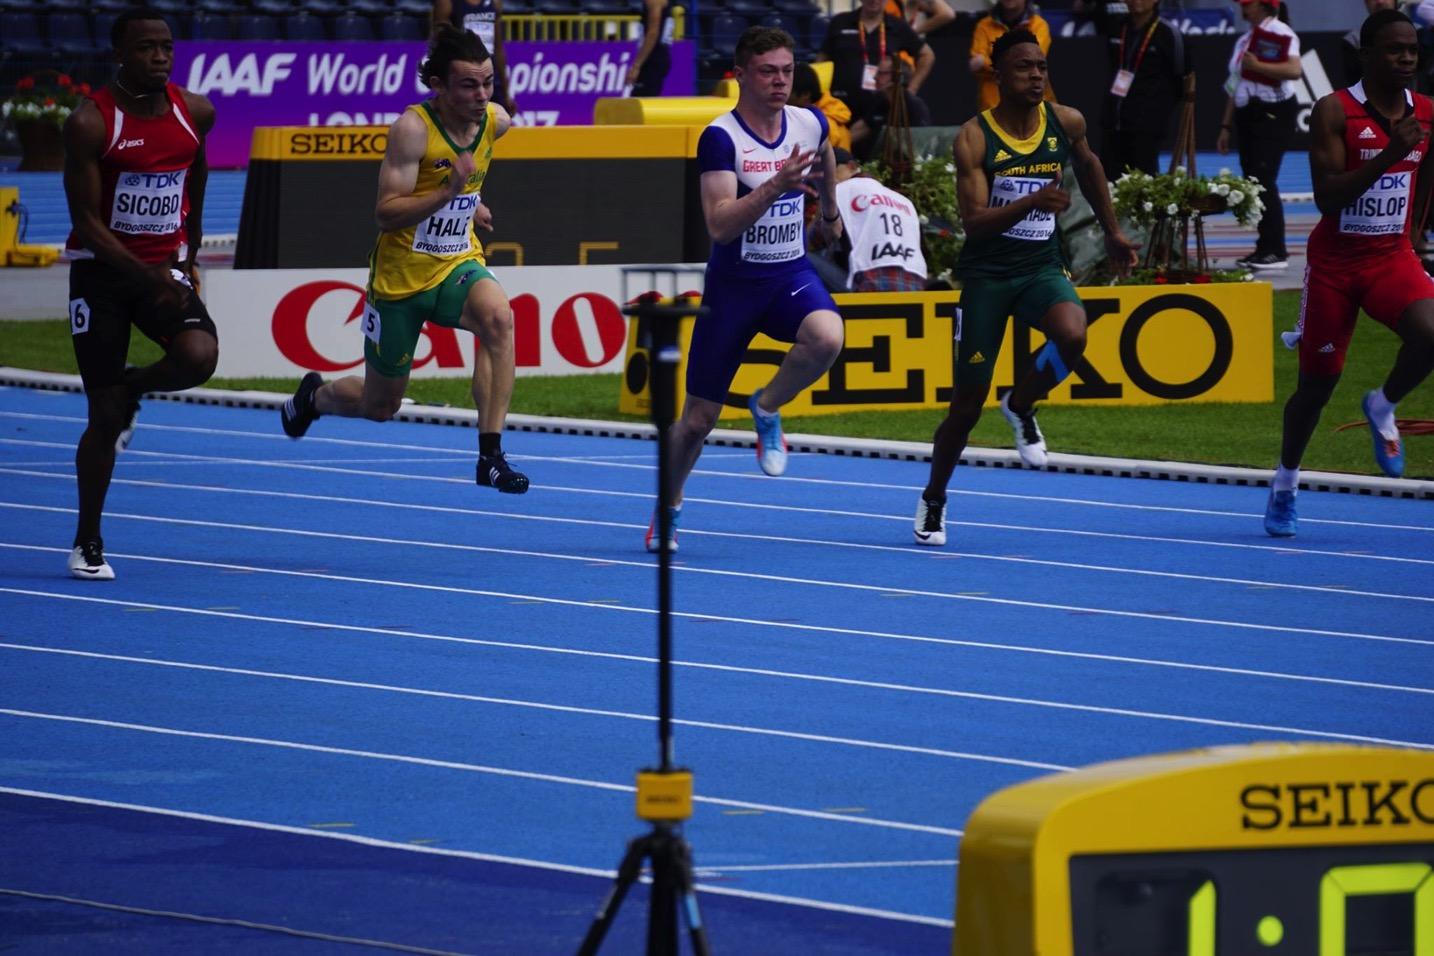 Stadion Zawisza Bydgoszcz World U20 Champs: Photo thanks to Athletics Australia